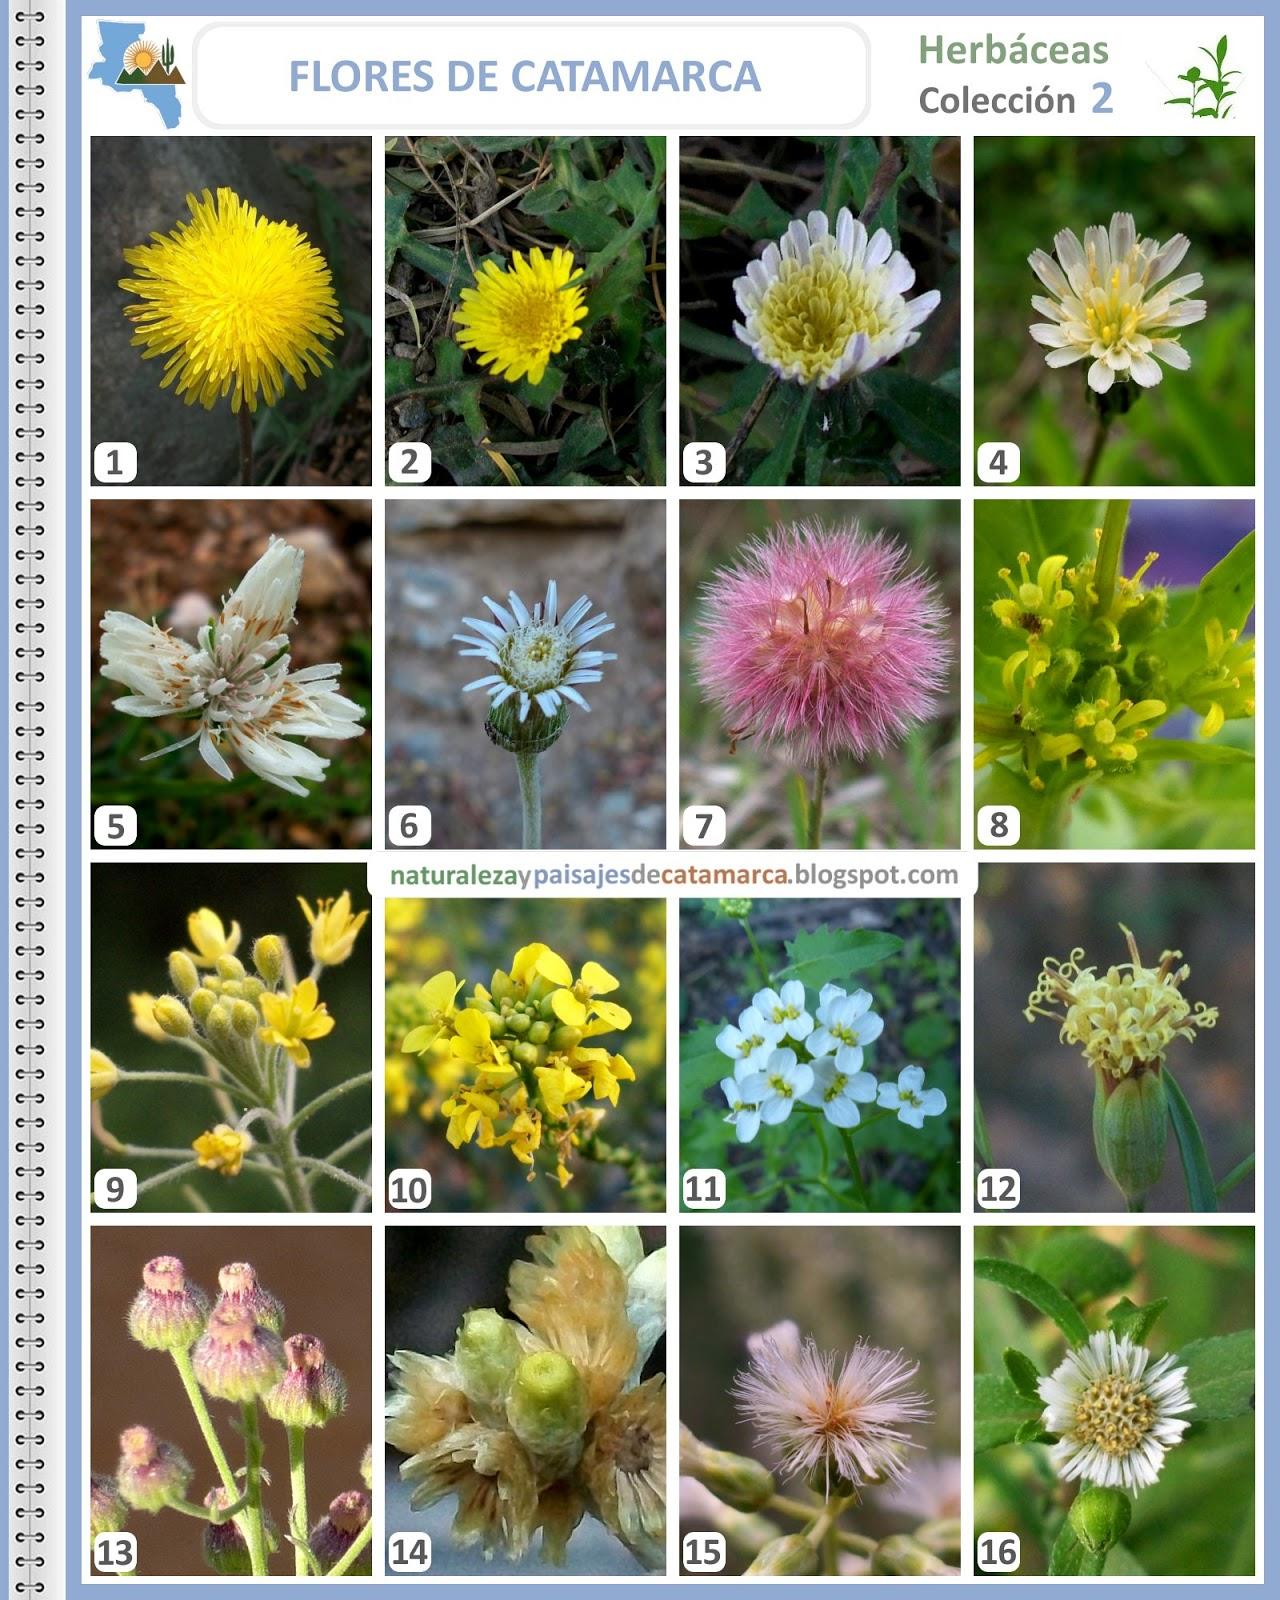 Naturaleza y paisajes de catamarca flores silvestres de Nombres de plantas comunes